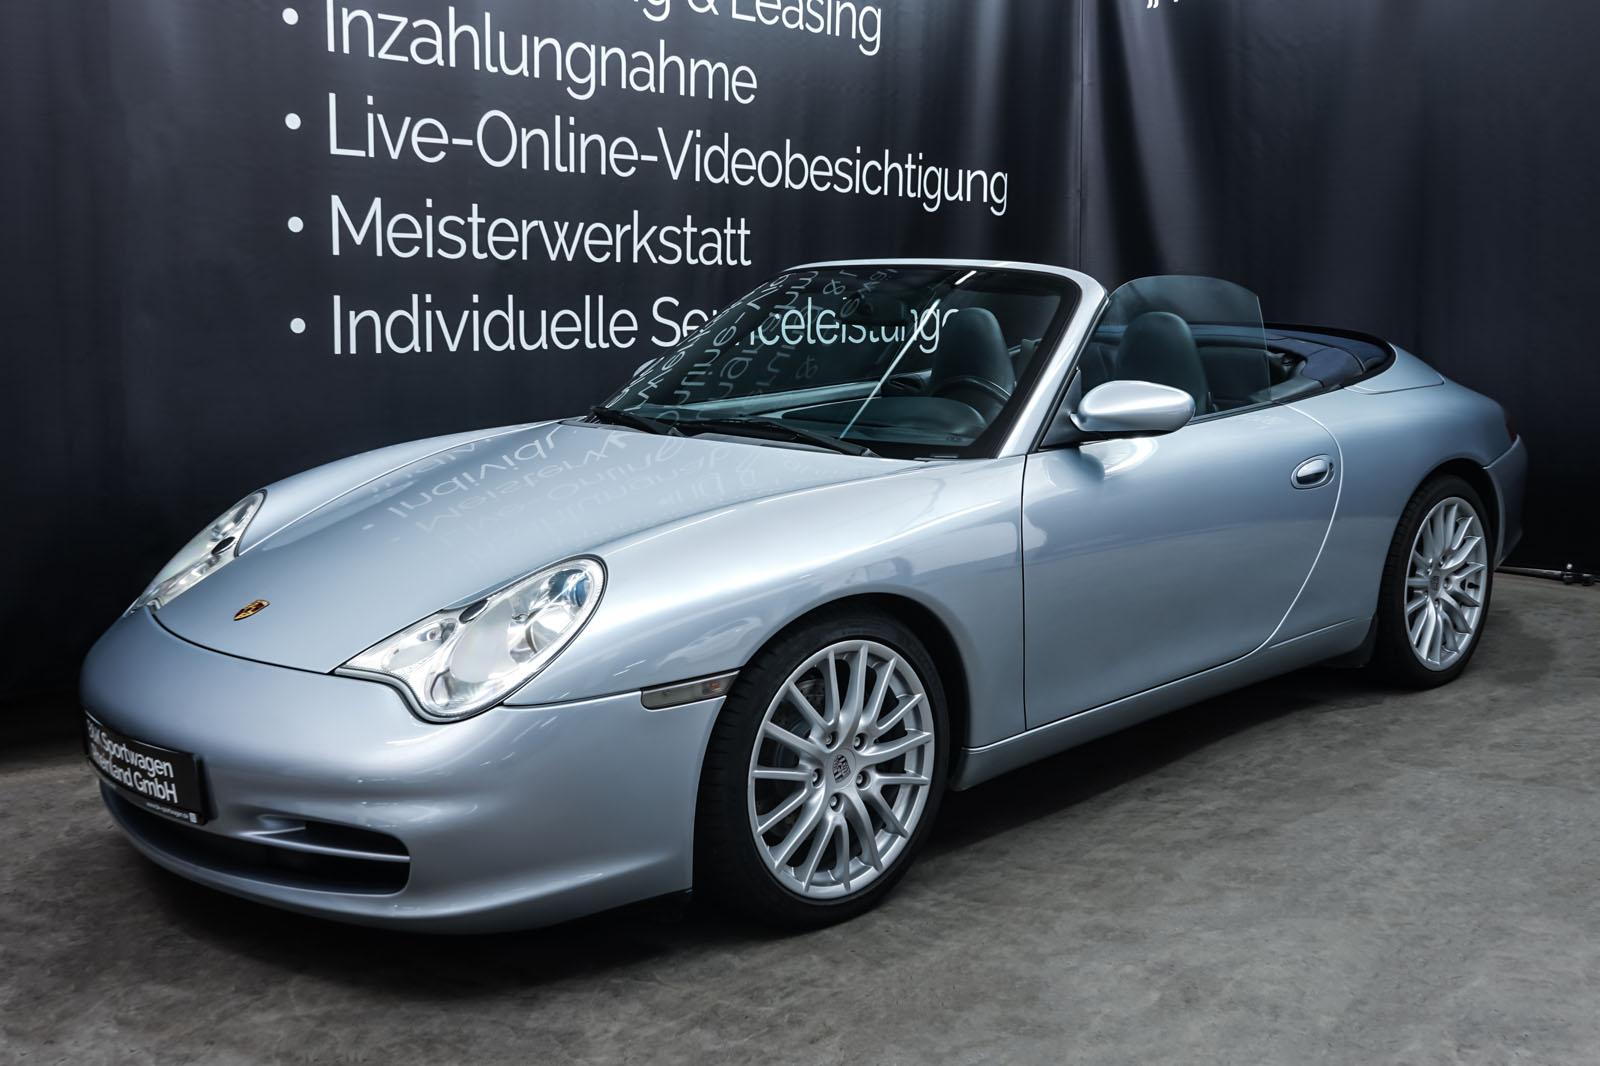 Porsche_996_Cabrio_Silber_Dunkelblau_POR-1724_7_w